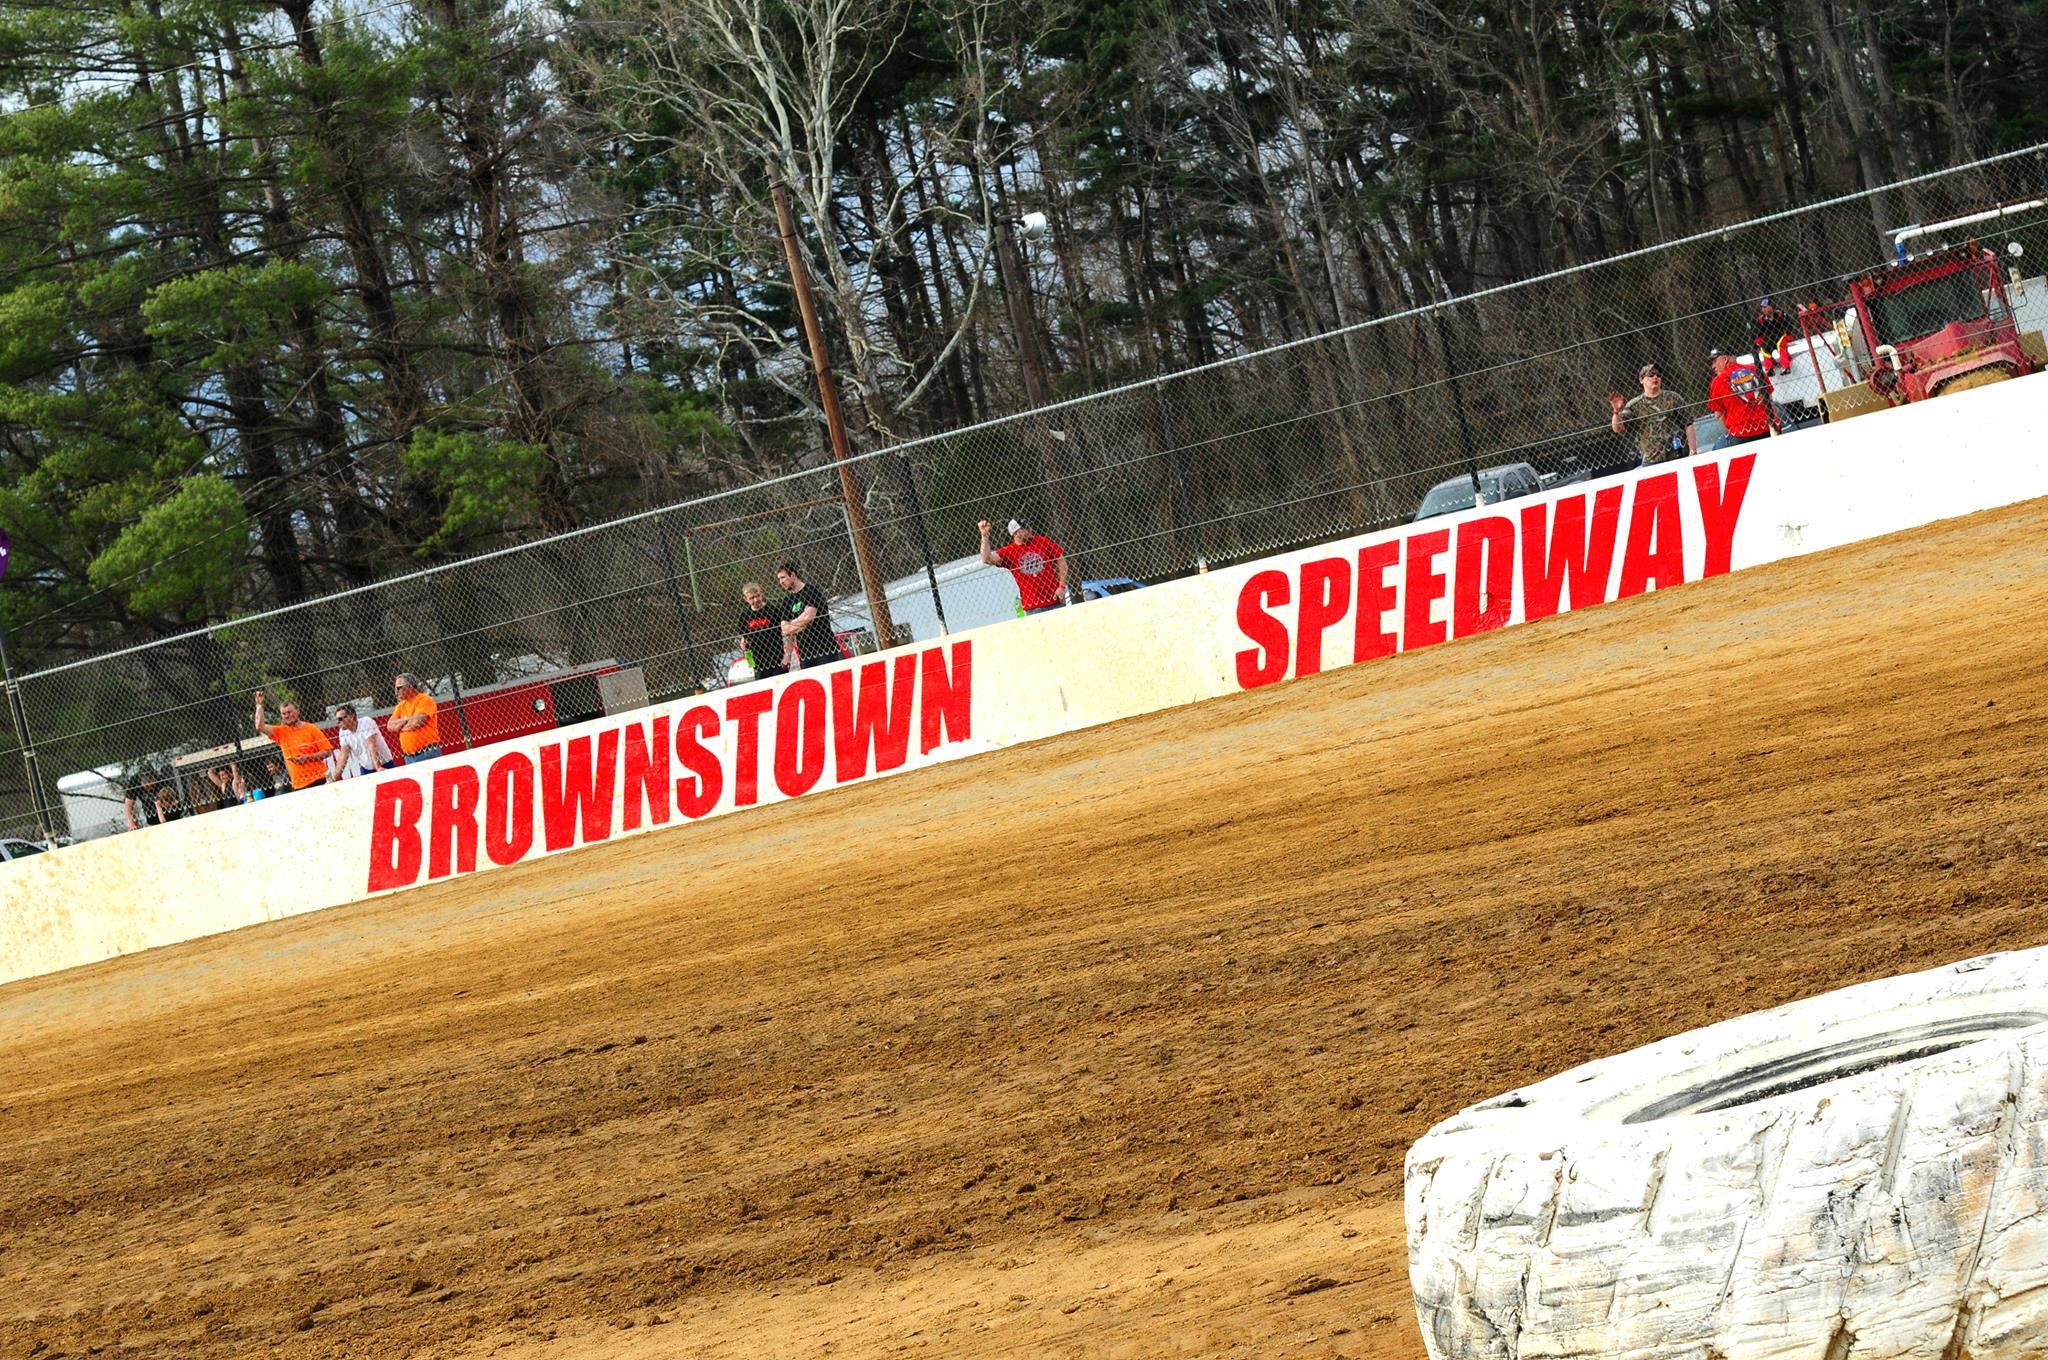 2017 Jackson 100 Results - September 23, 2017 - Brownstown Speedway